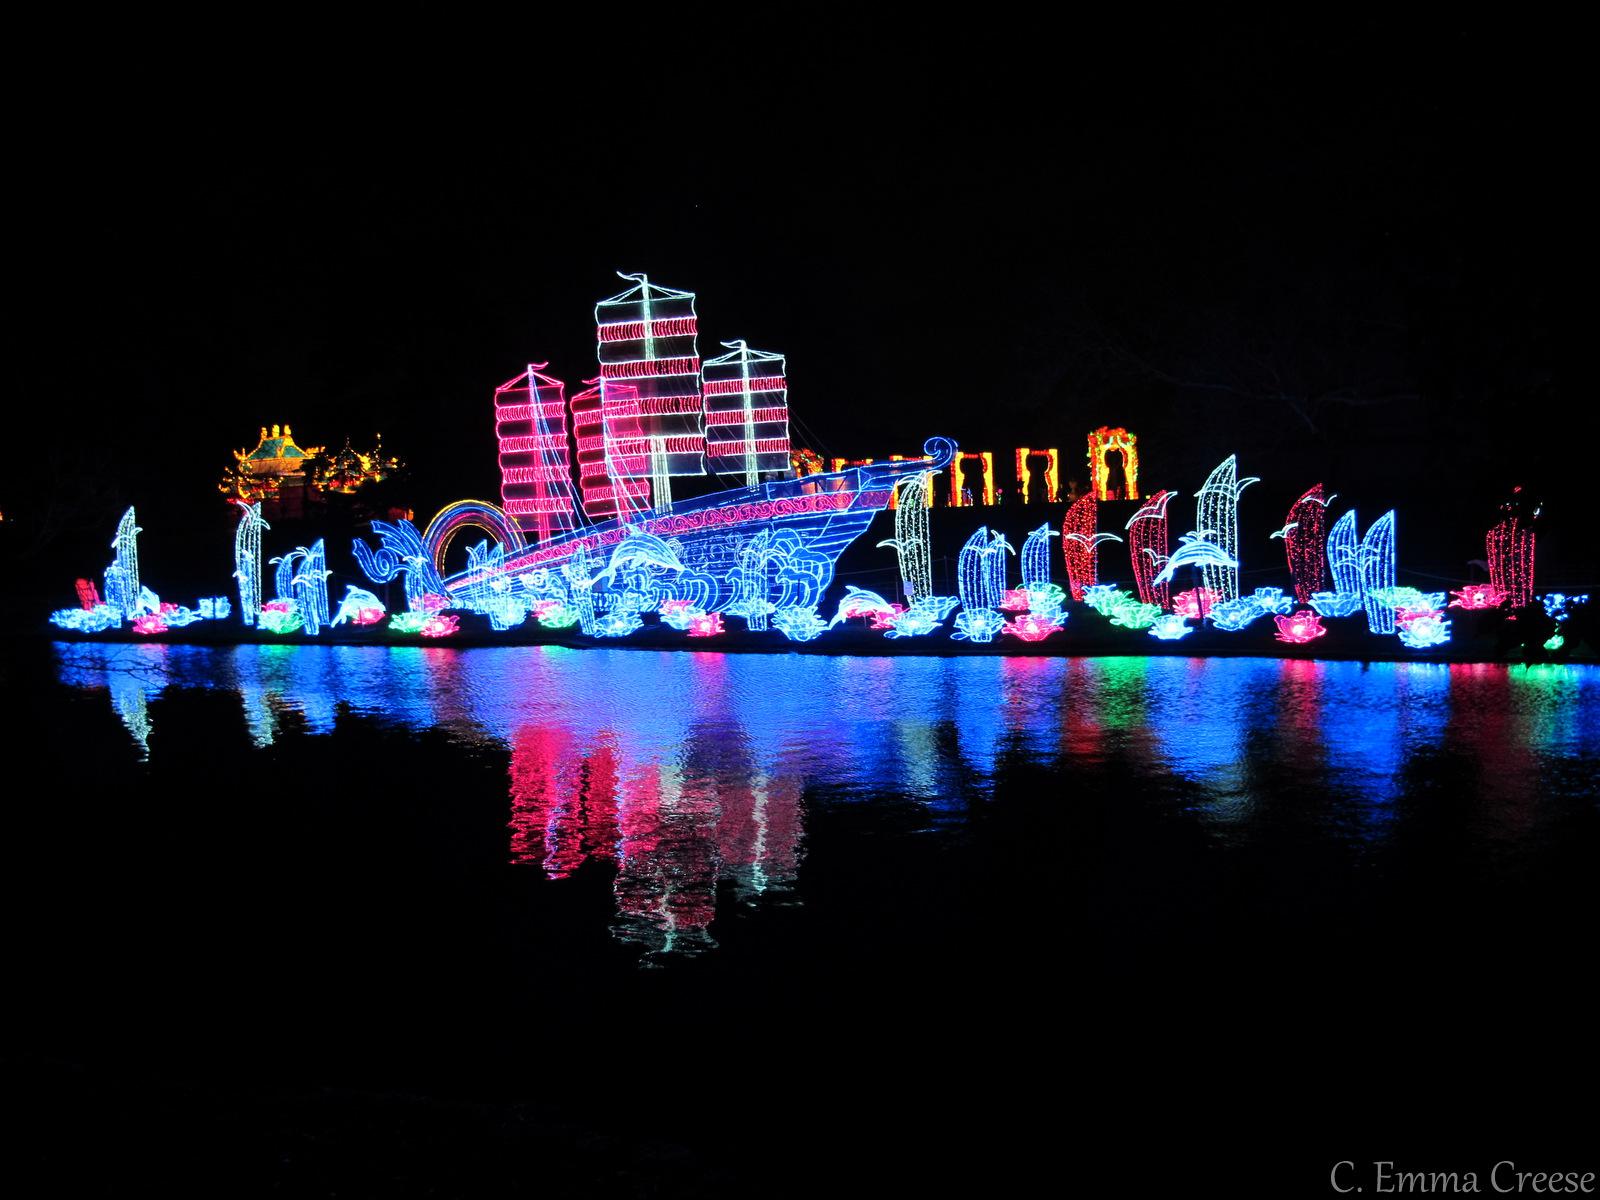 Chiswick House Chinese Lantern Festival Adventures of a London Kiwi